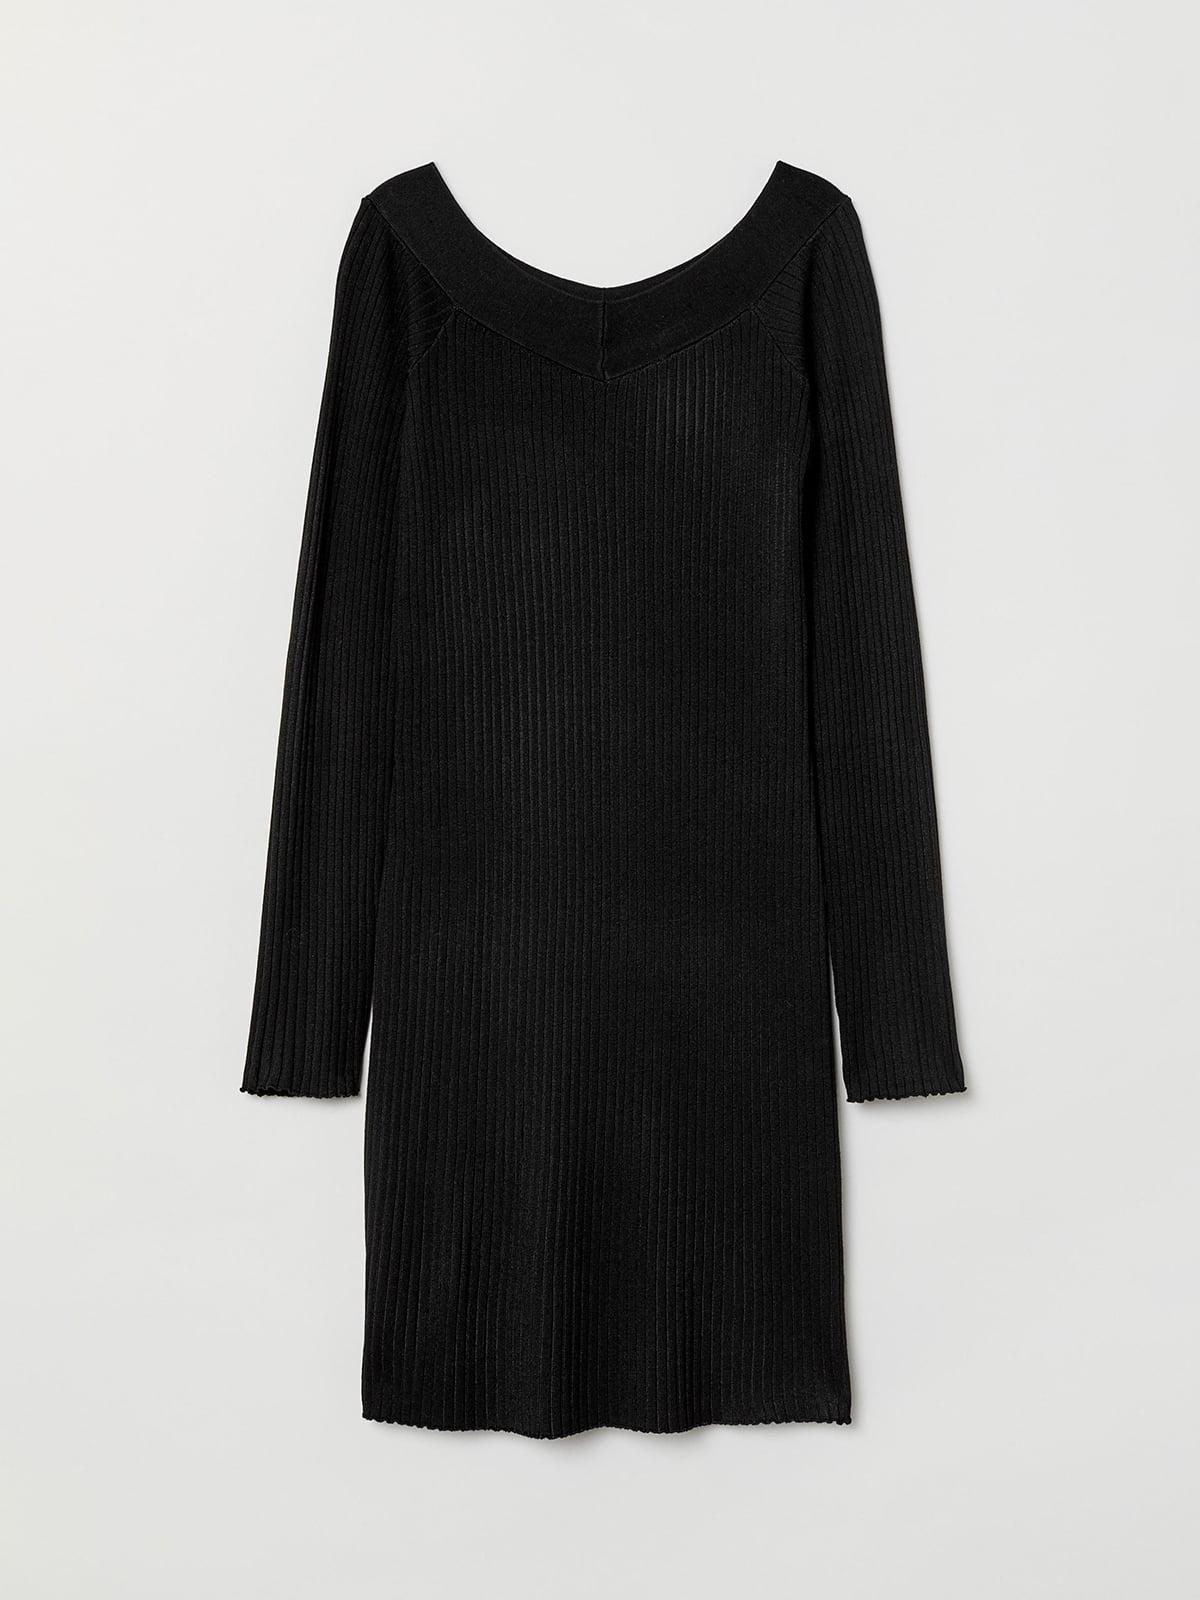 Сукня чорна   5574268